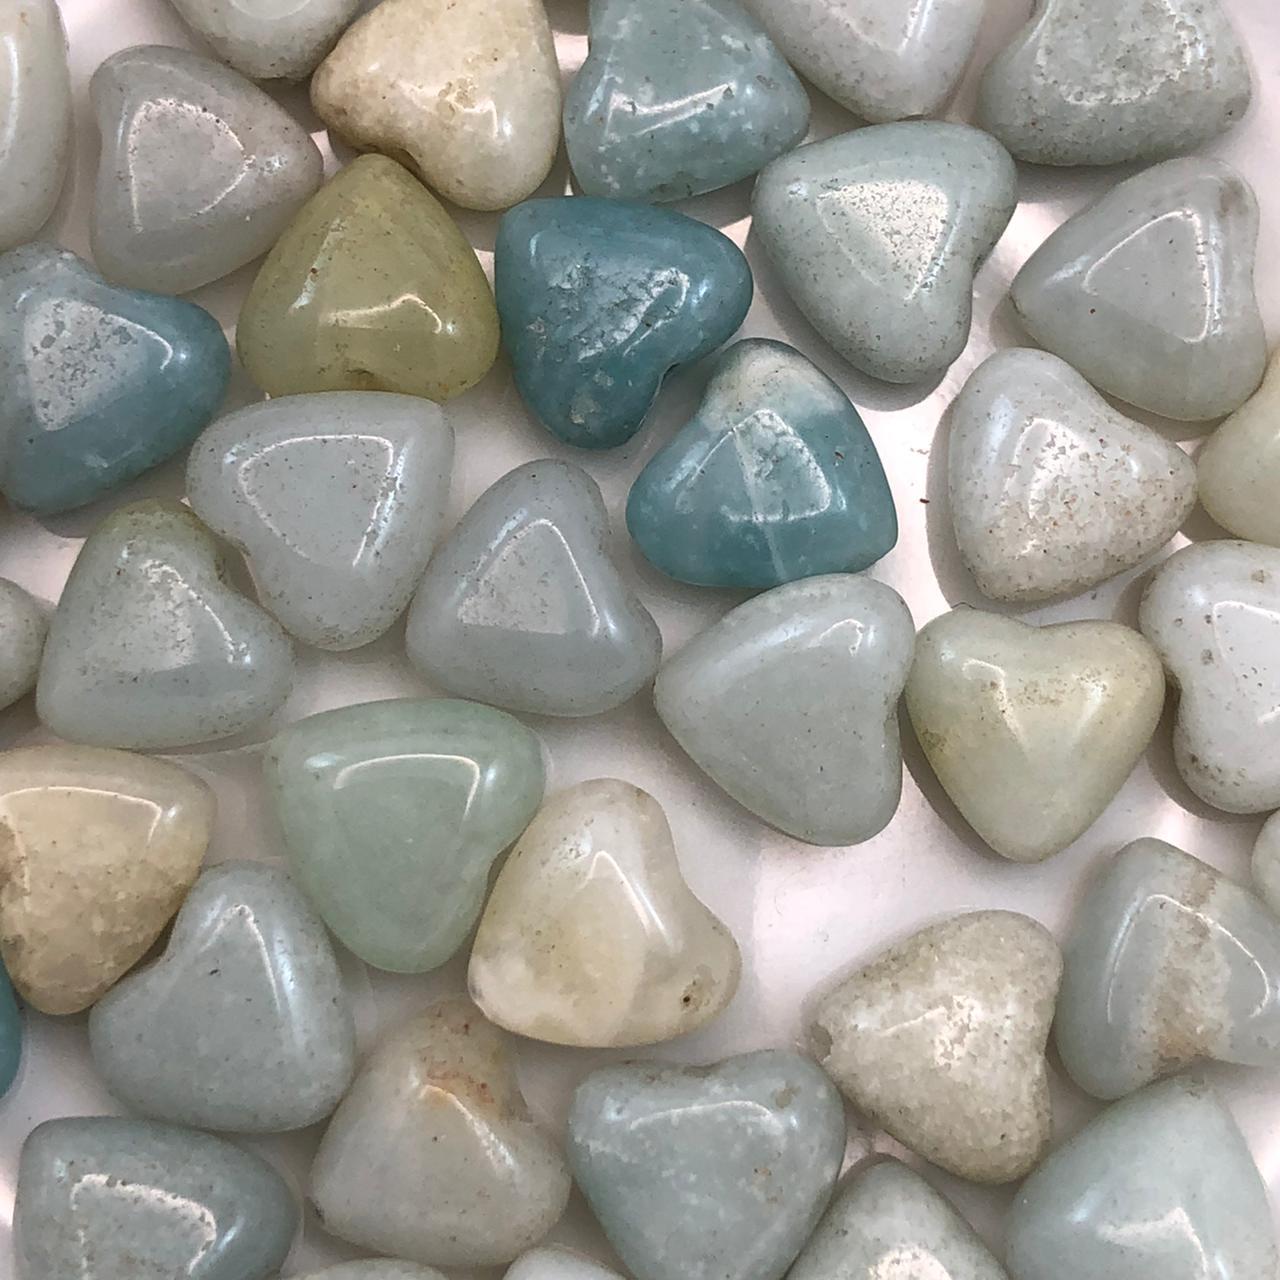 PN126 - Coração Pedra Natural 10mm Amazonita - 04Unids